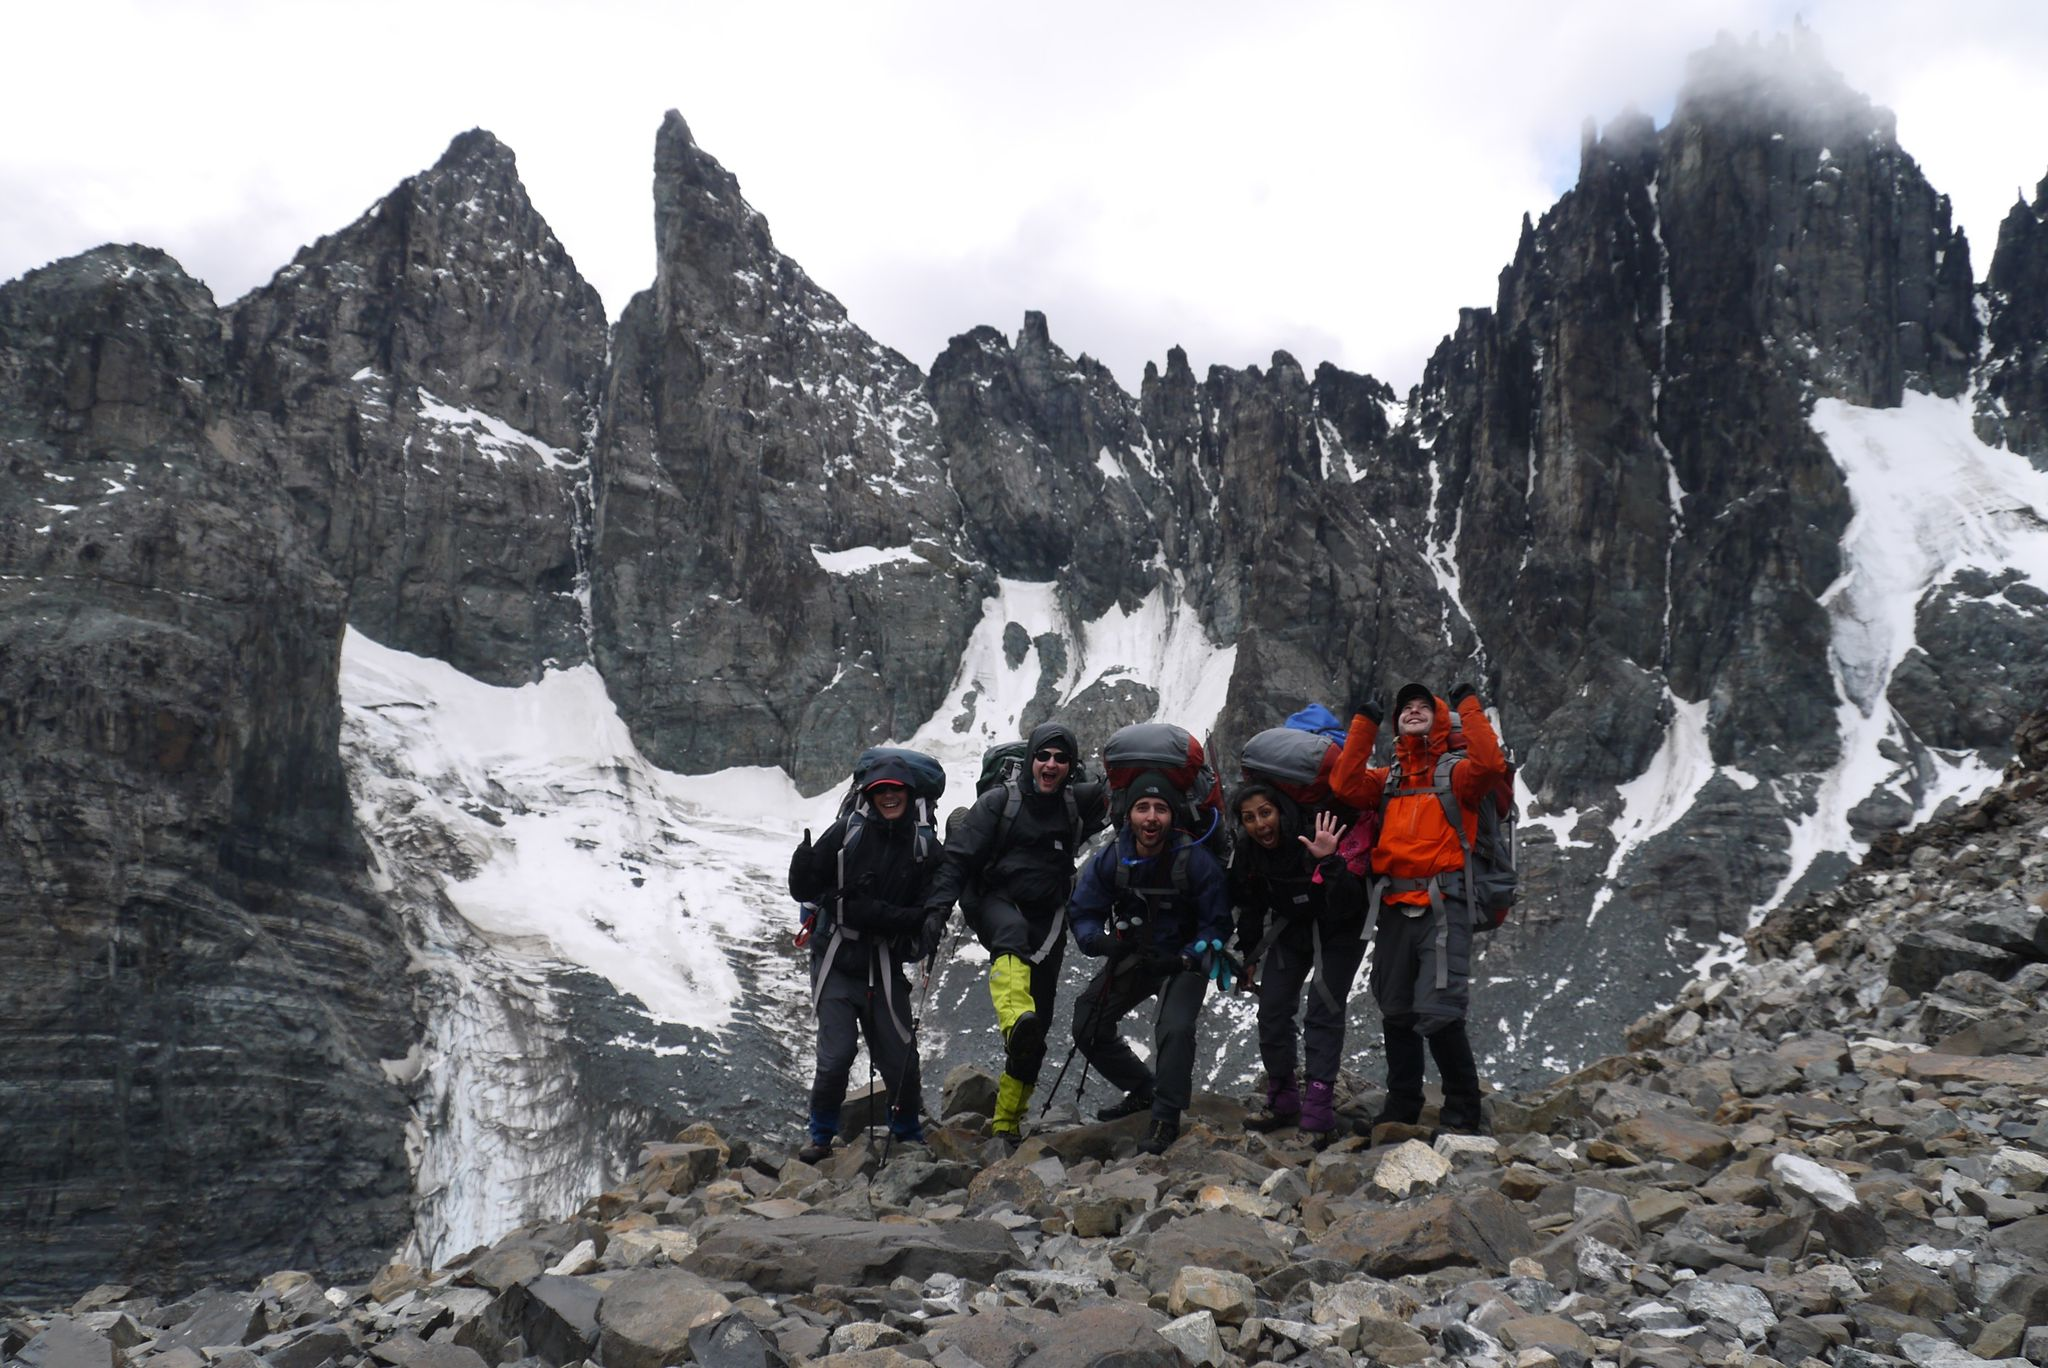 Gap Year Program - NOLS Fall Gap Semester in Patagonia  2